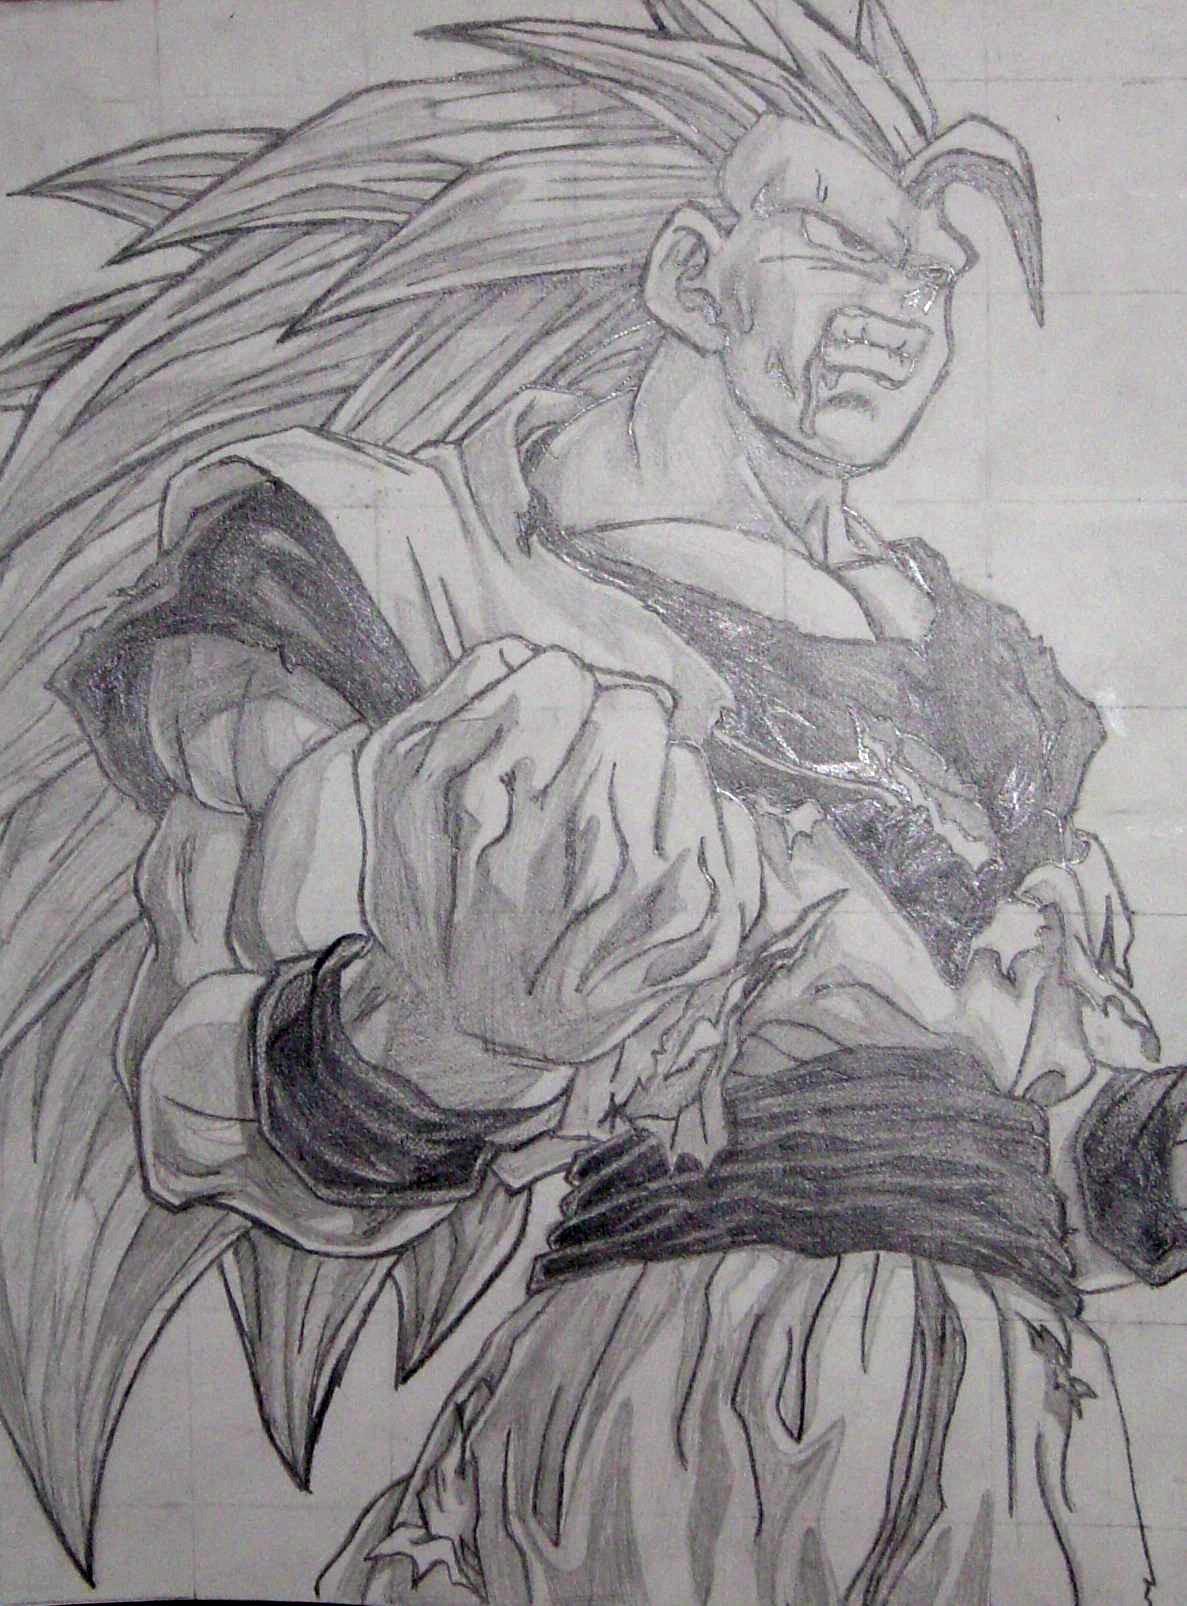 Dragon Ball Z By Tat2chick On DeviantArt